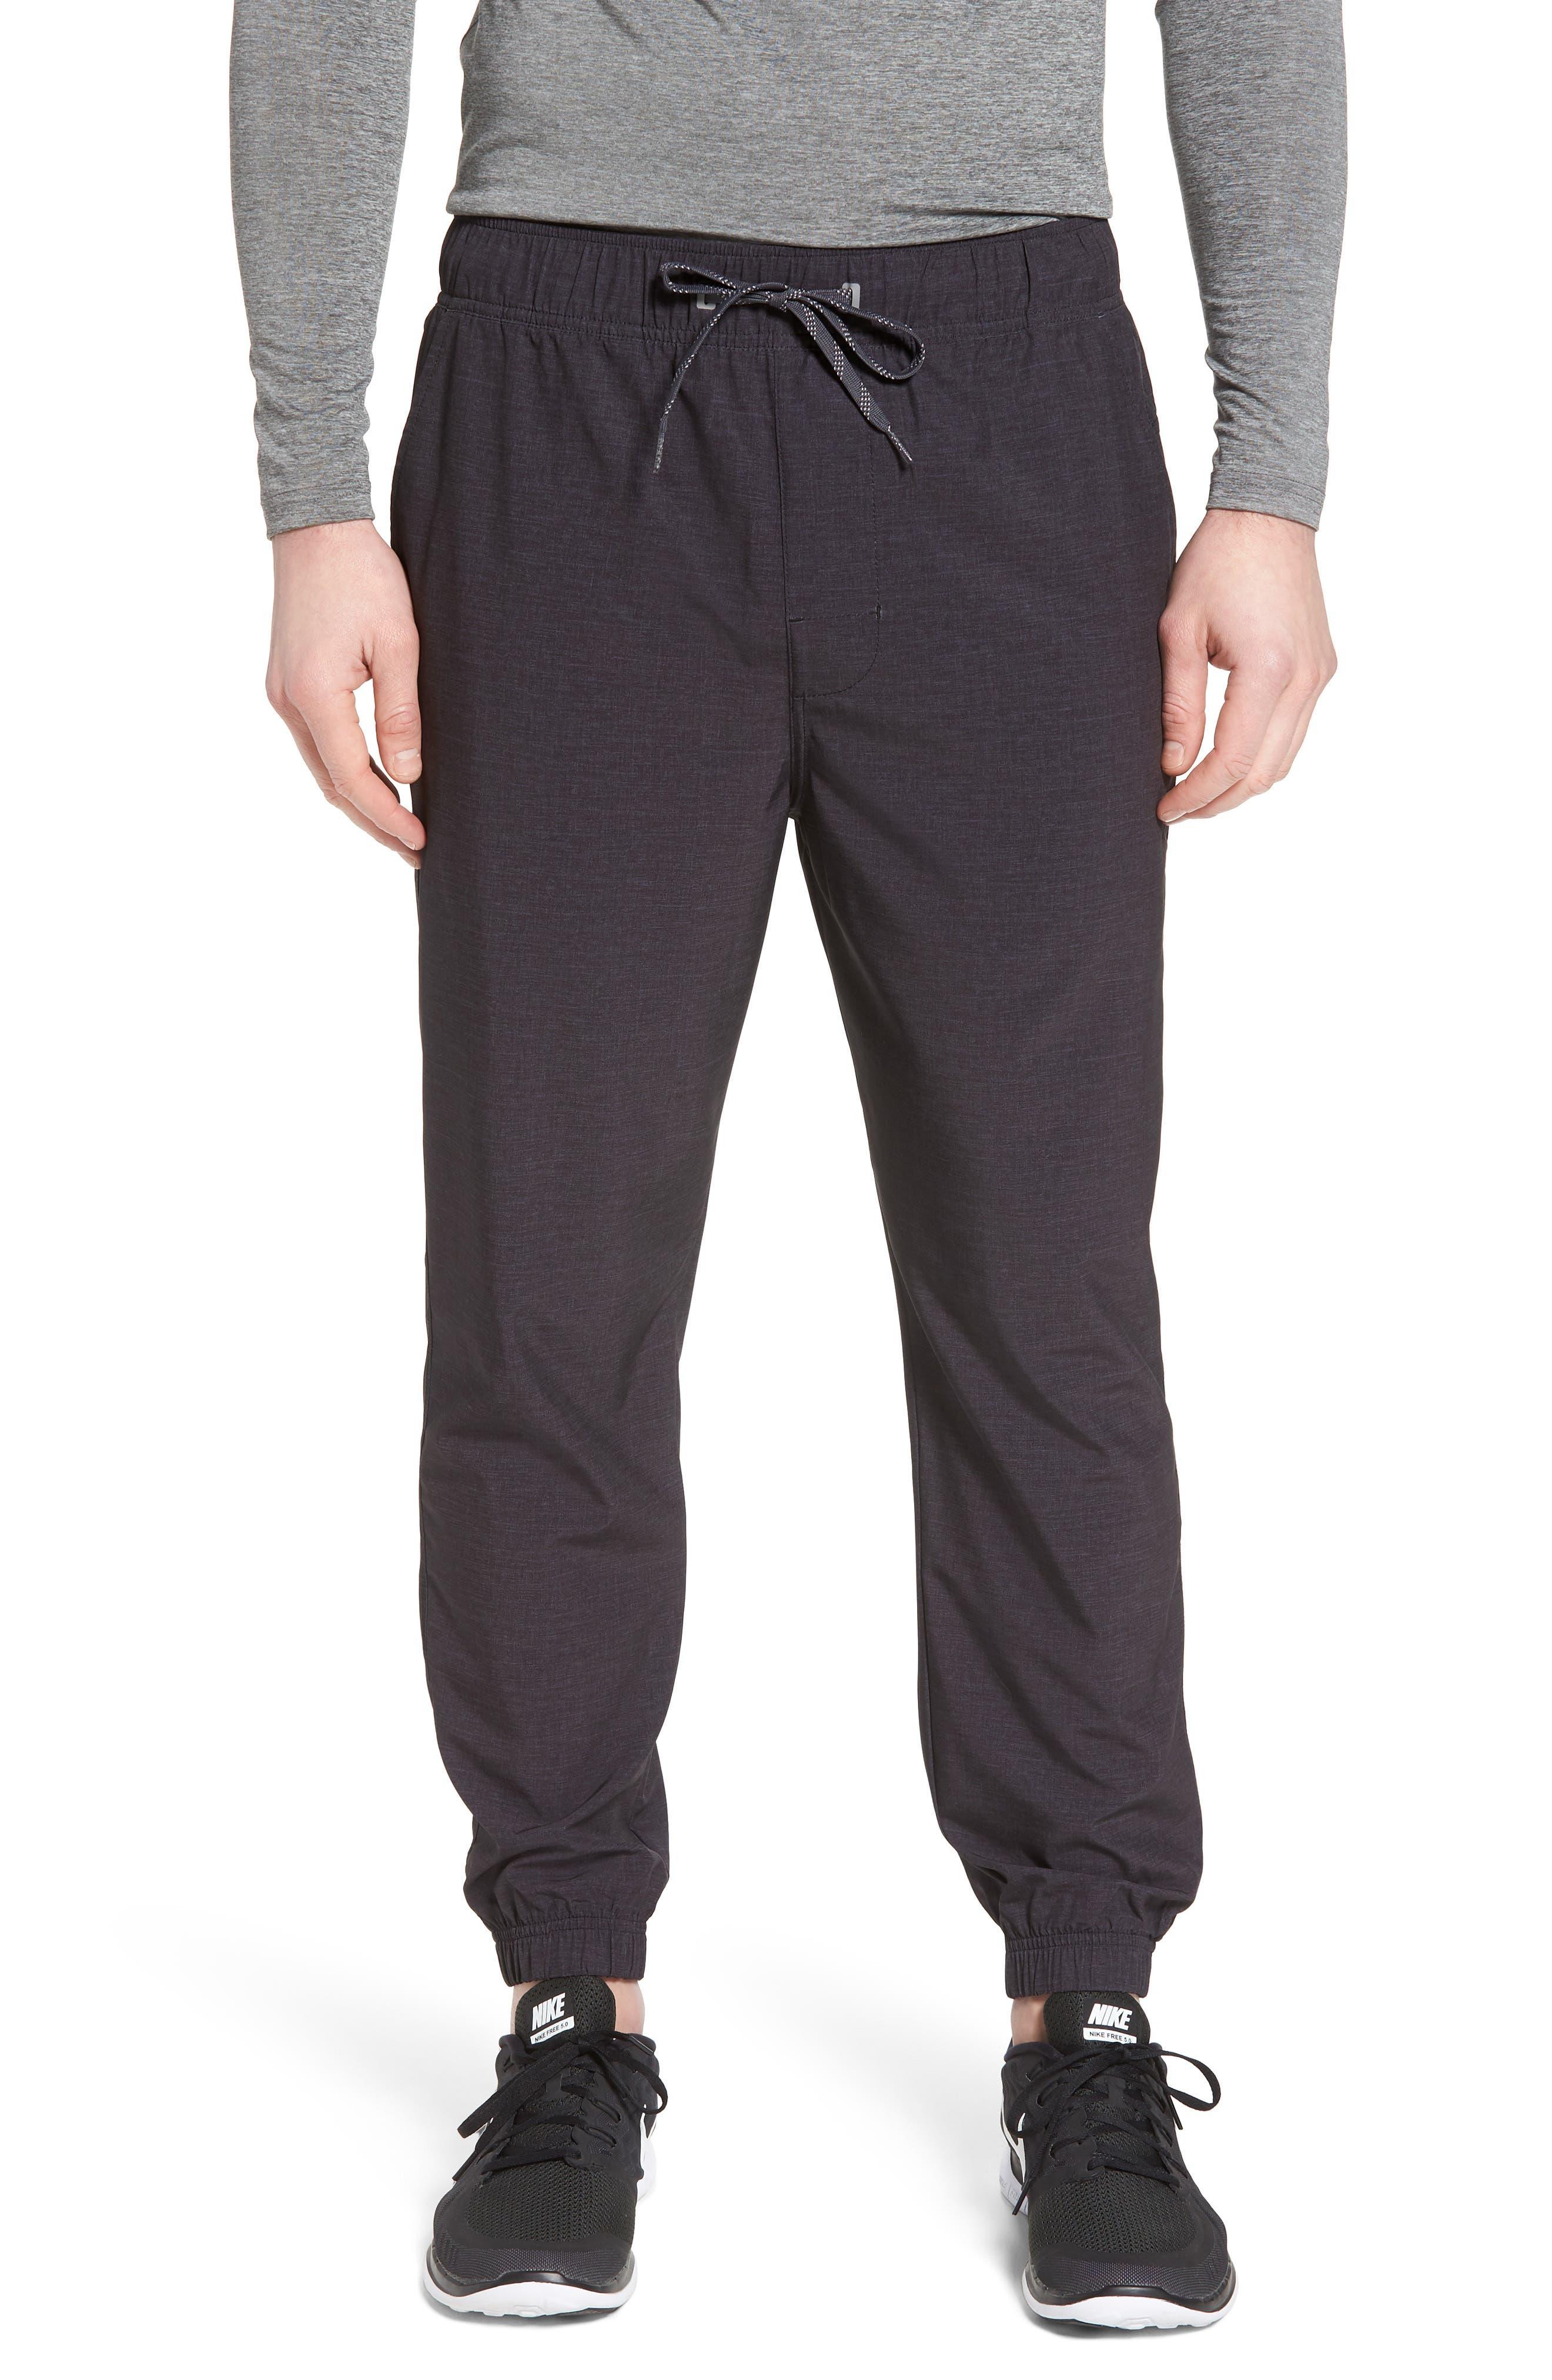 Spencer Jogger Pants,                         Main,                         color, Black Heather